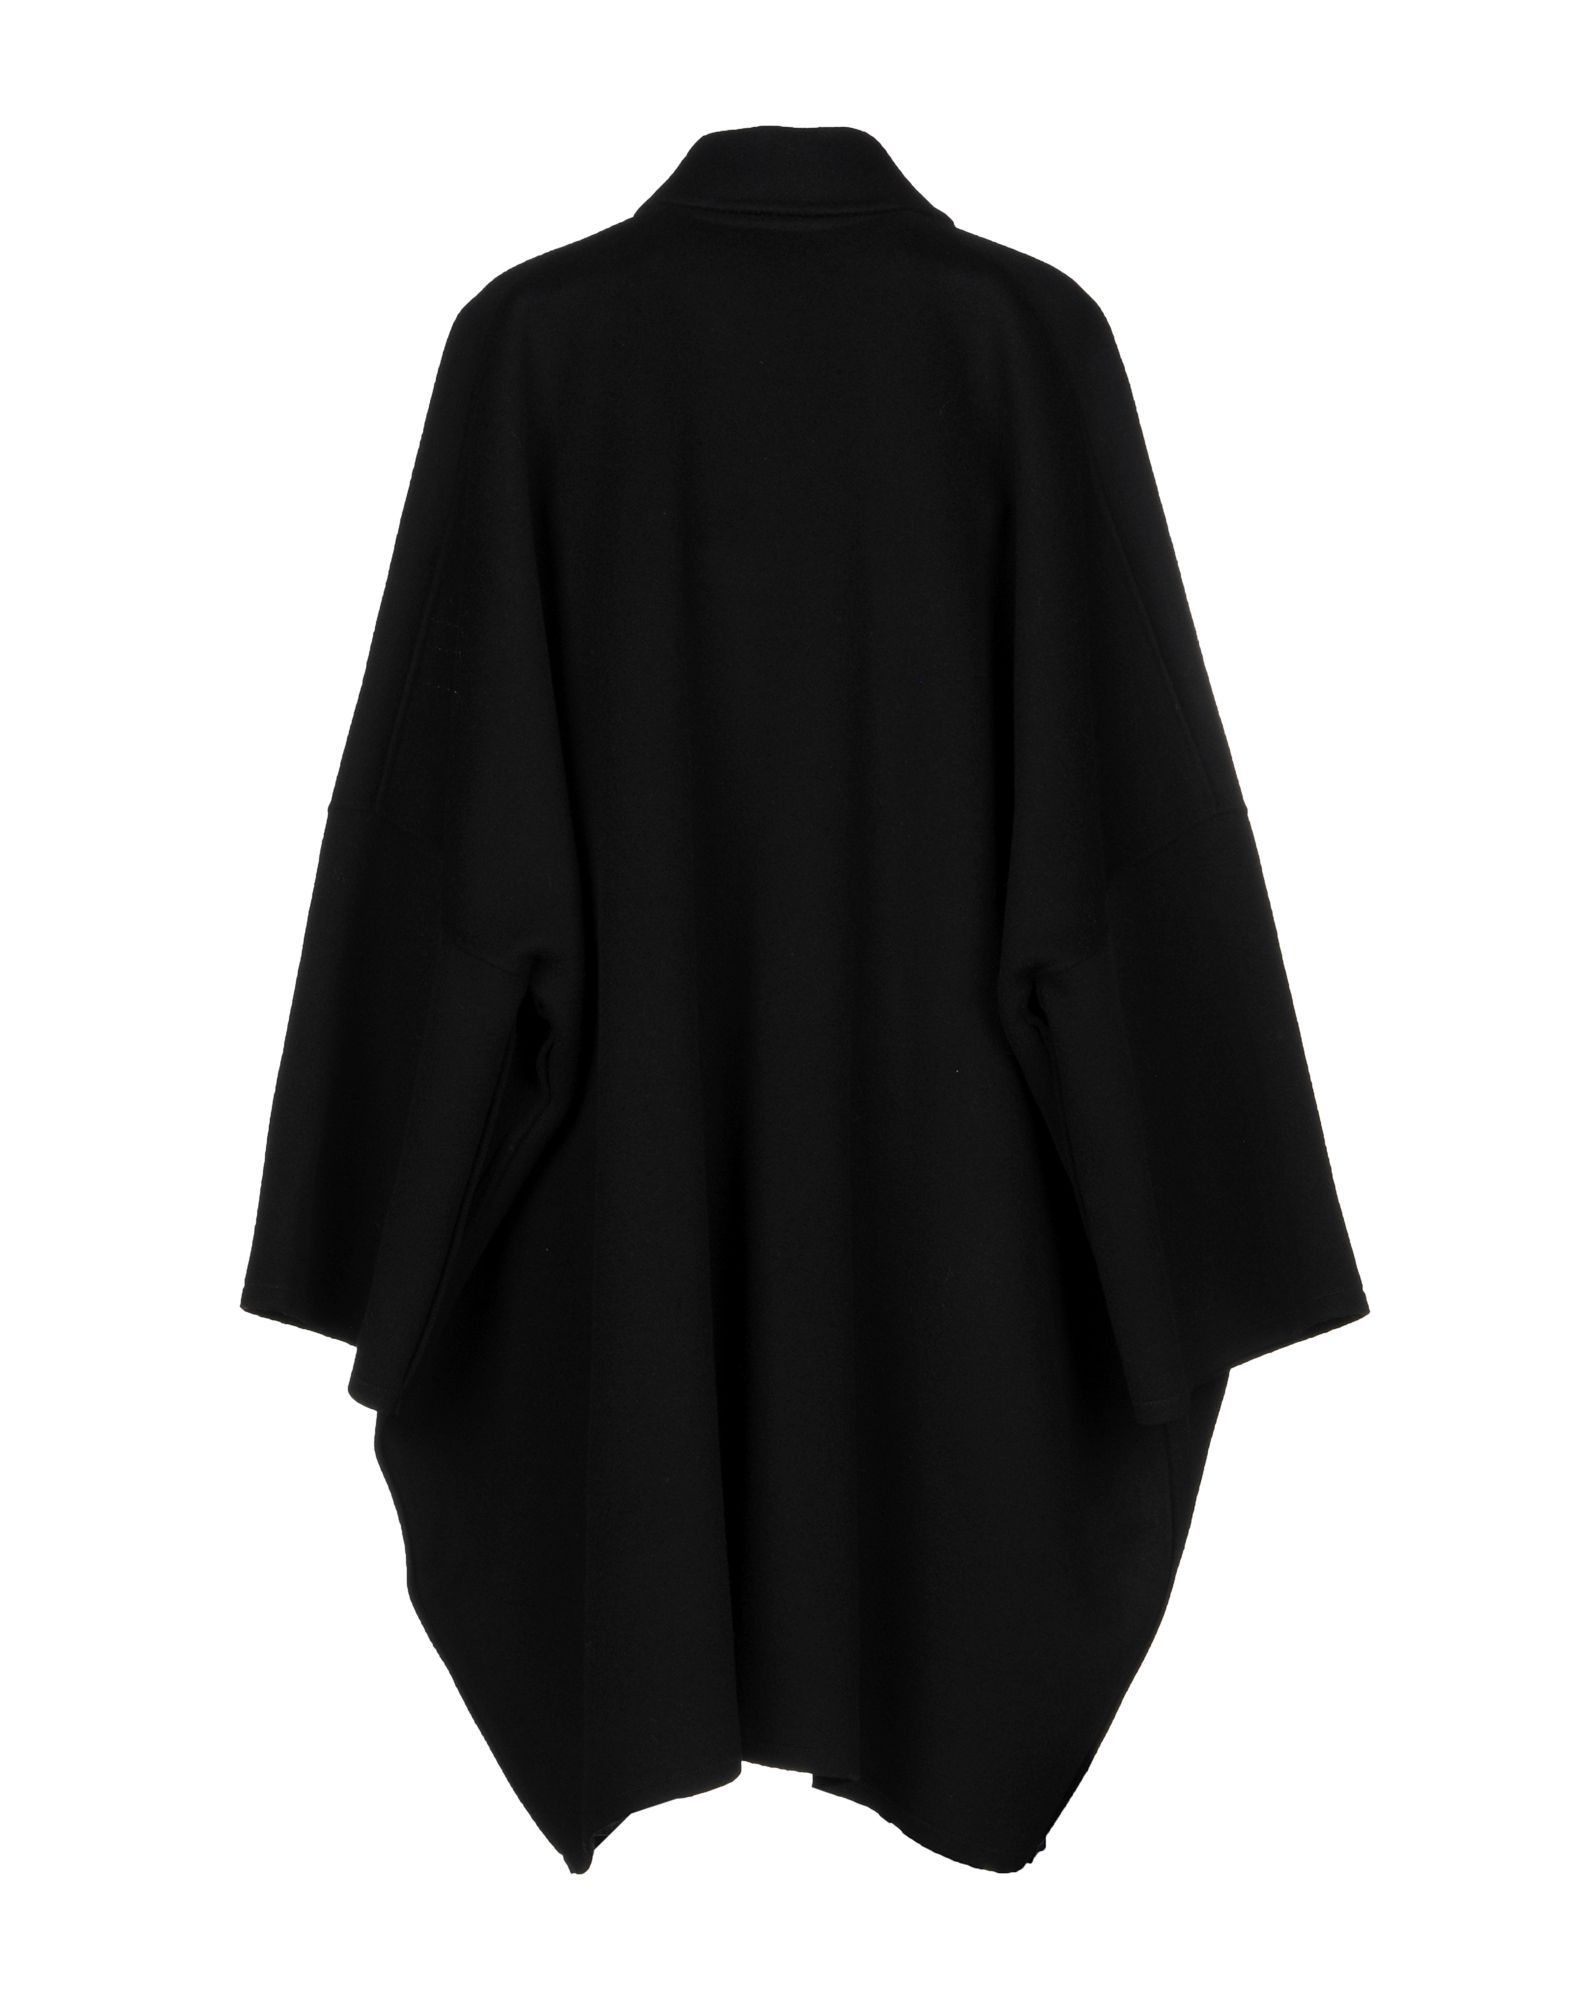 Helmut Lang Black Wool Coat